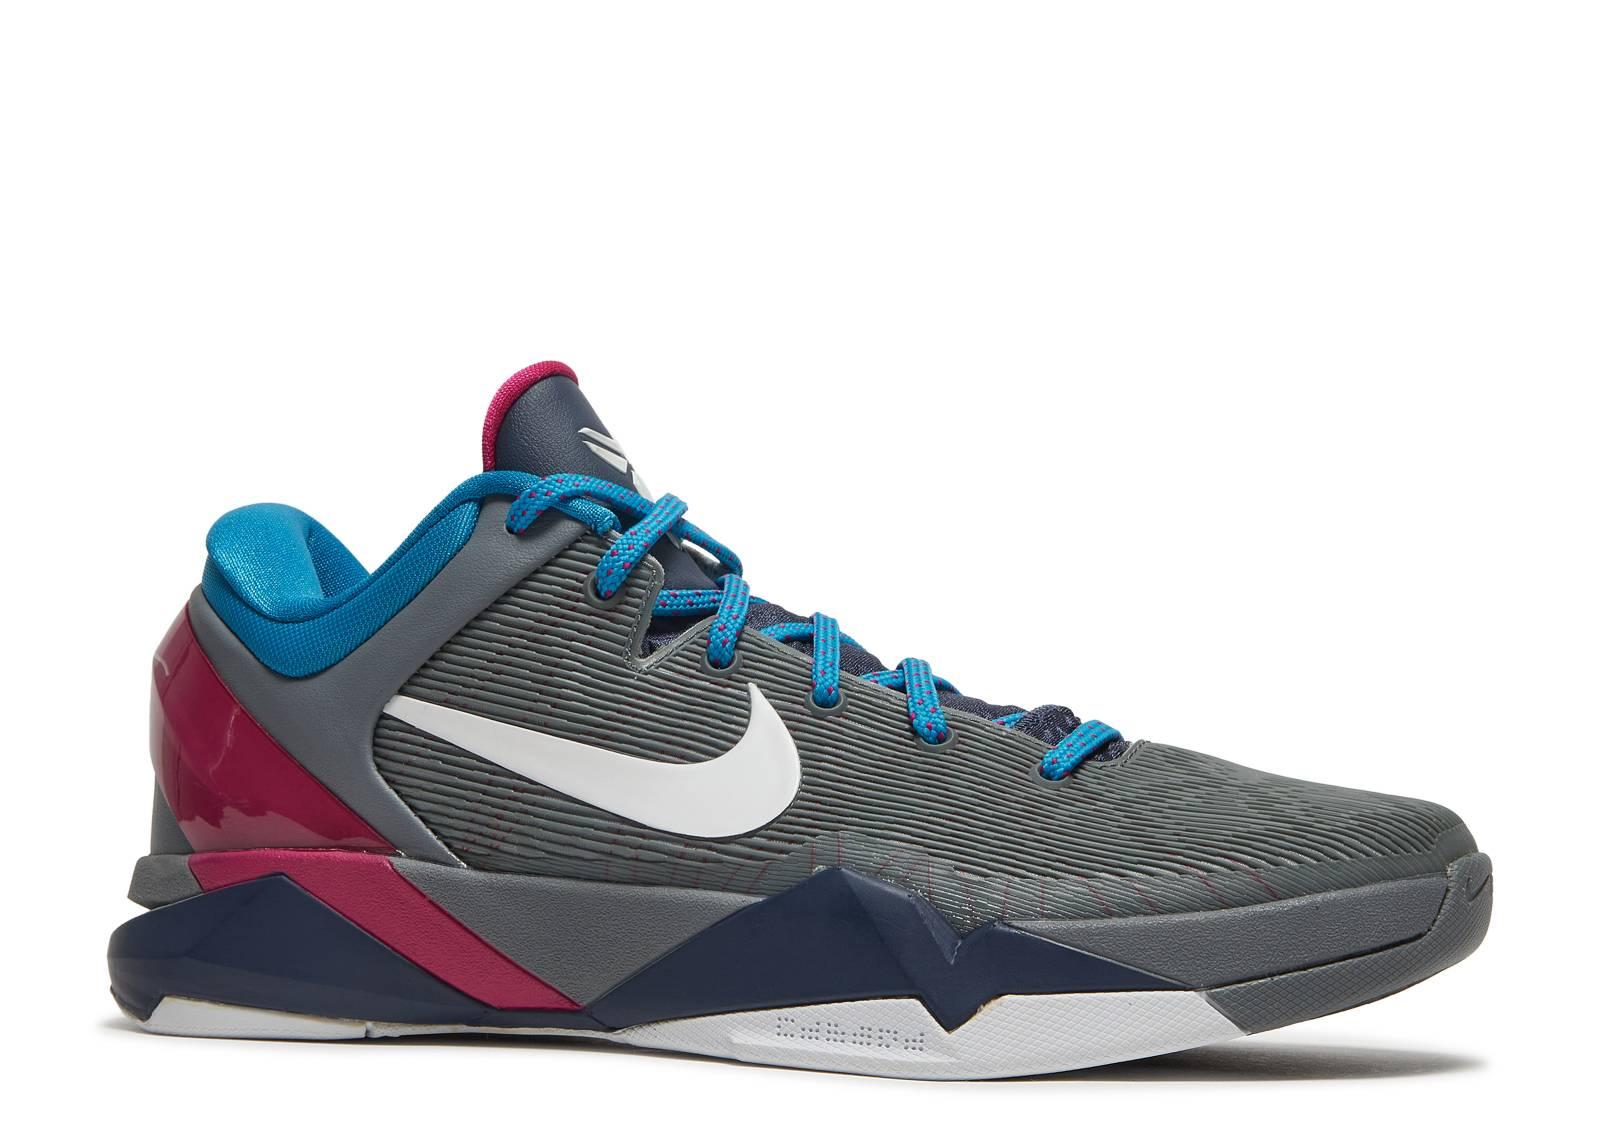 de47c2bb15d2 Fast Shipping Nike Kobe Cheap sale 7 POISON DART FROG Photo Bl ...